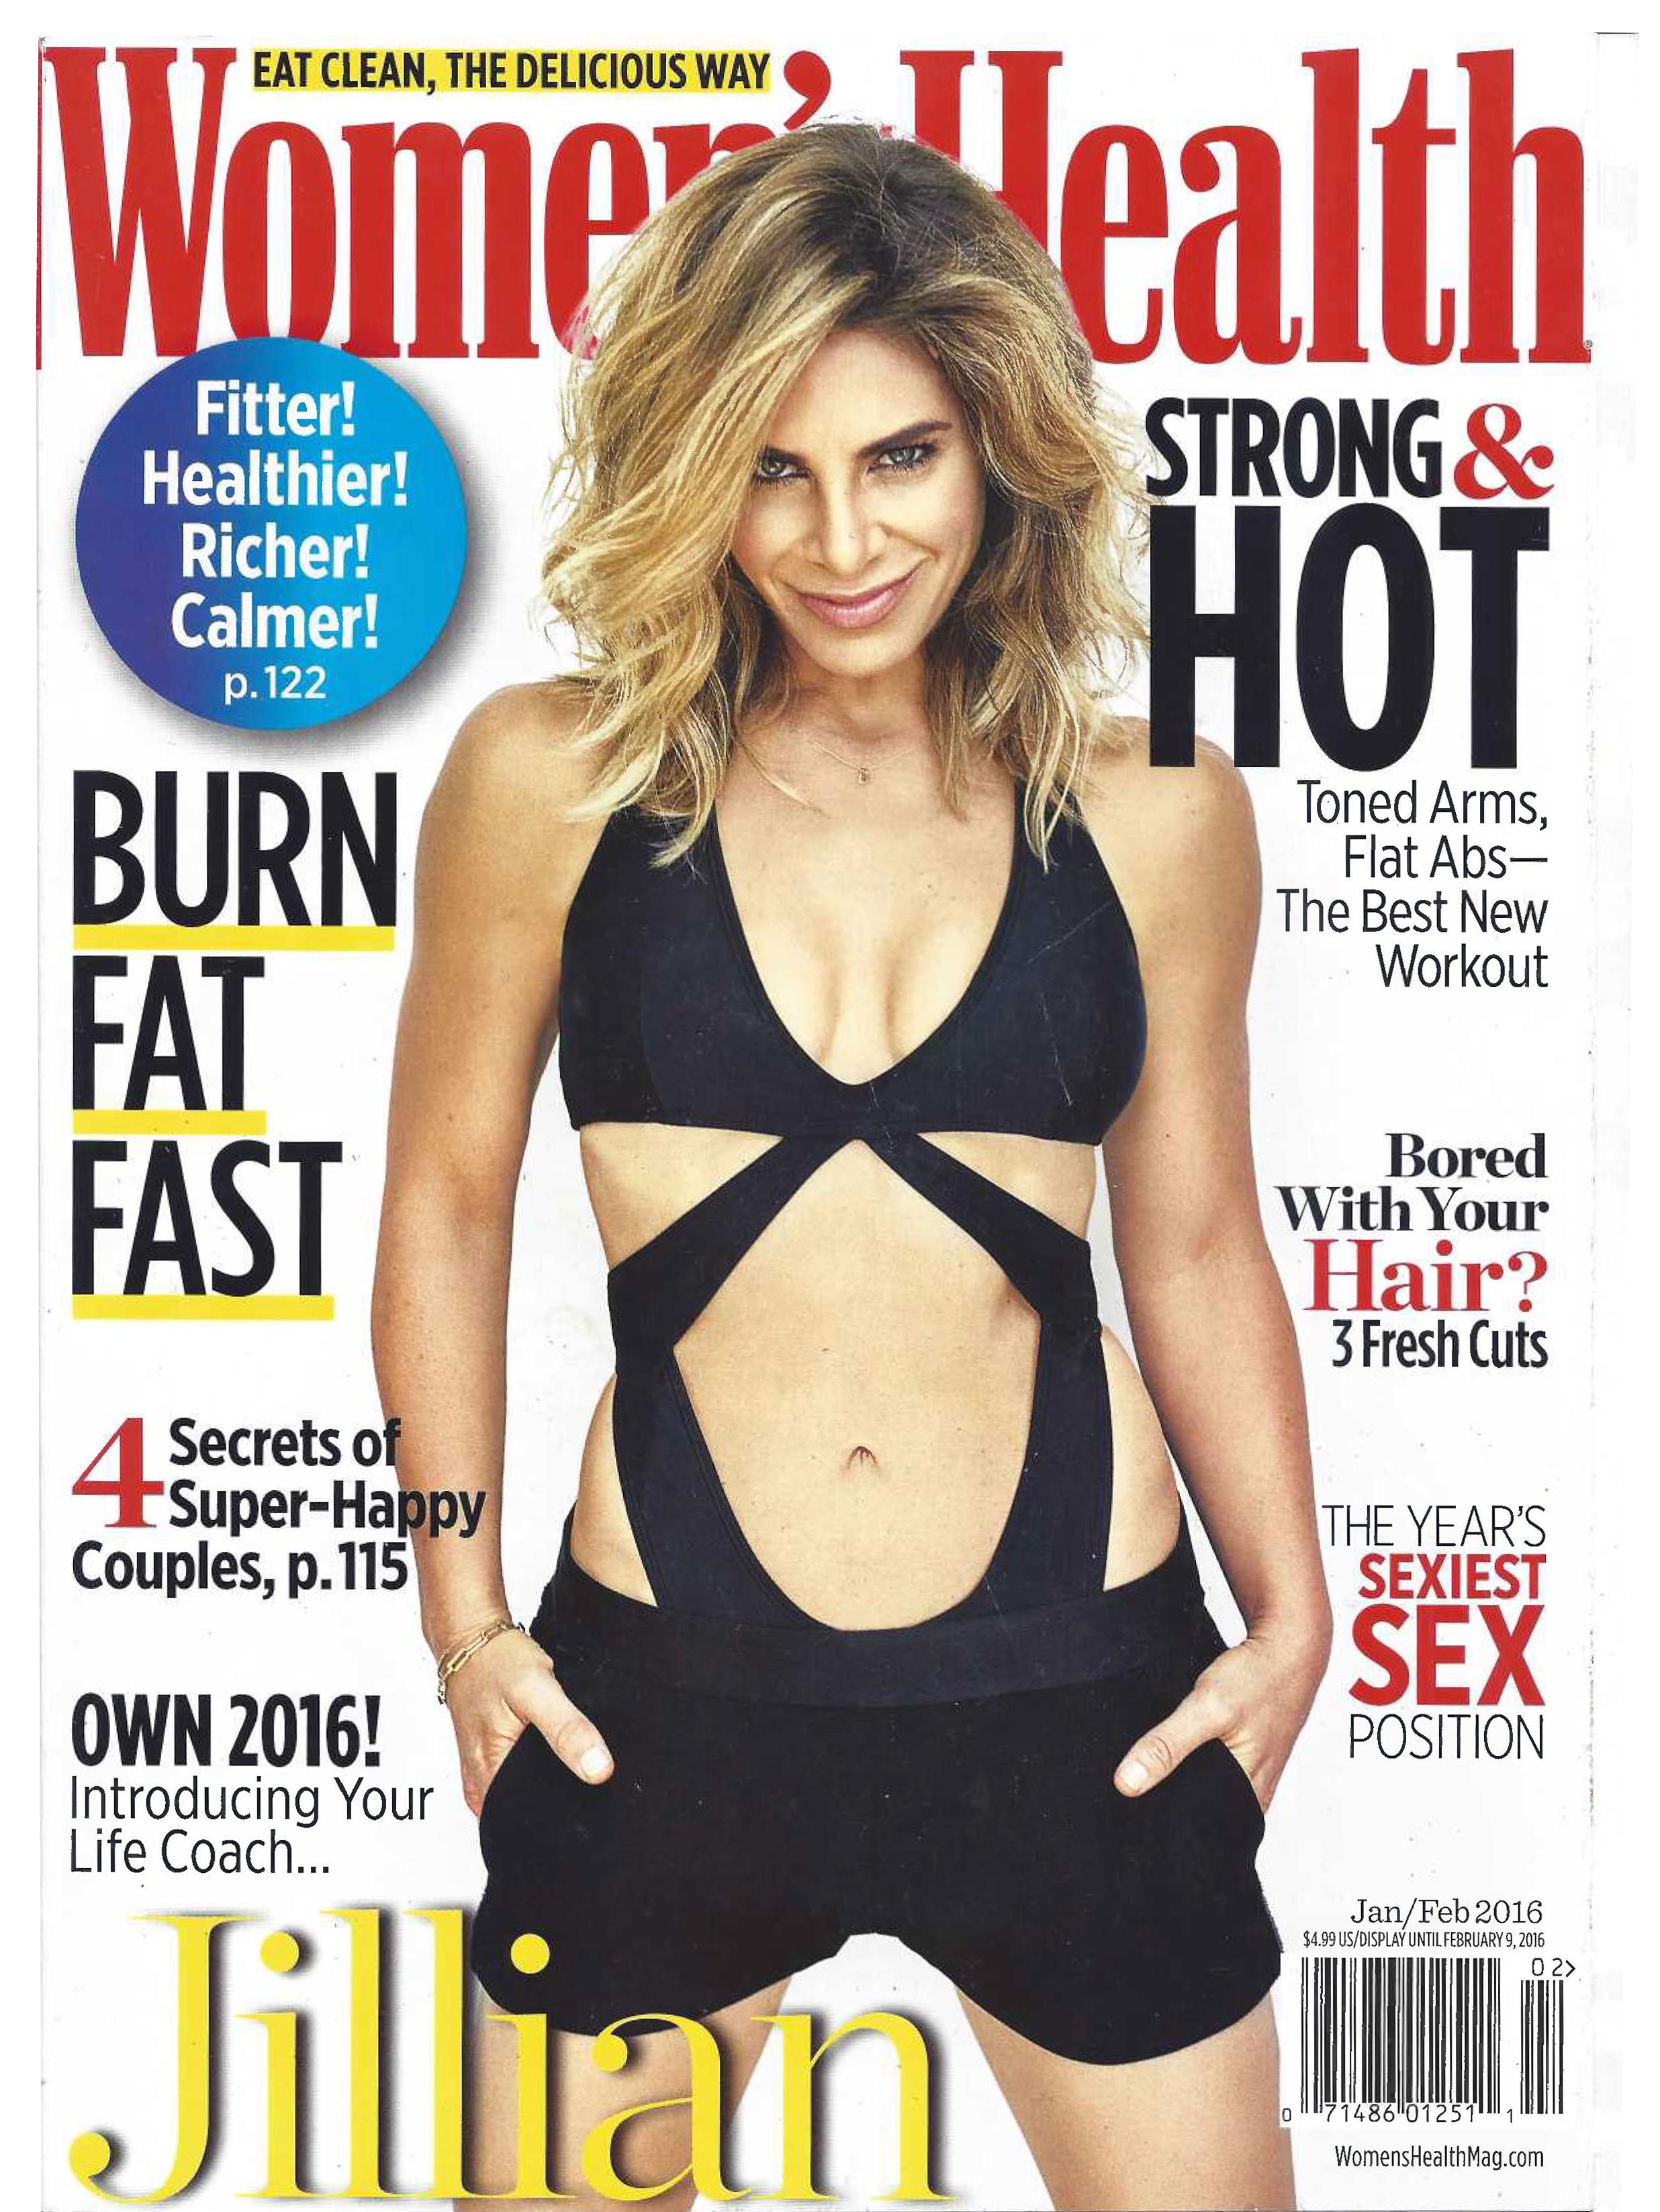 womens-health_Page_1.jpg